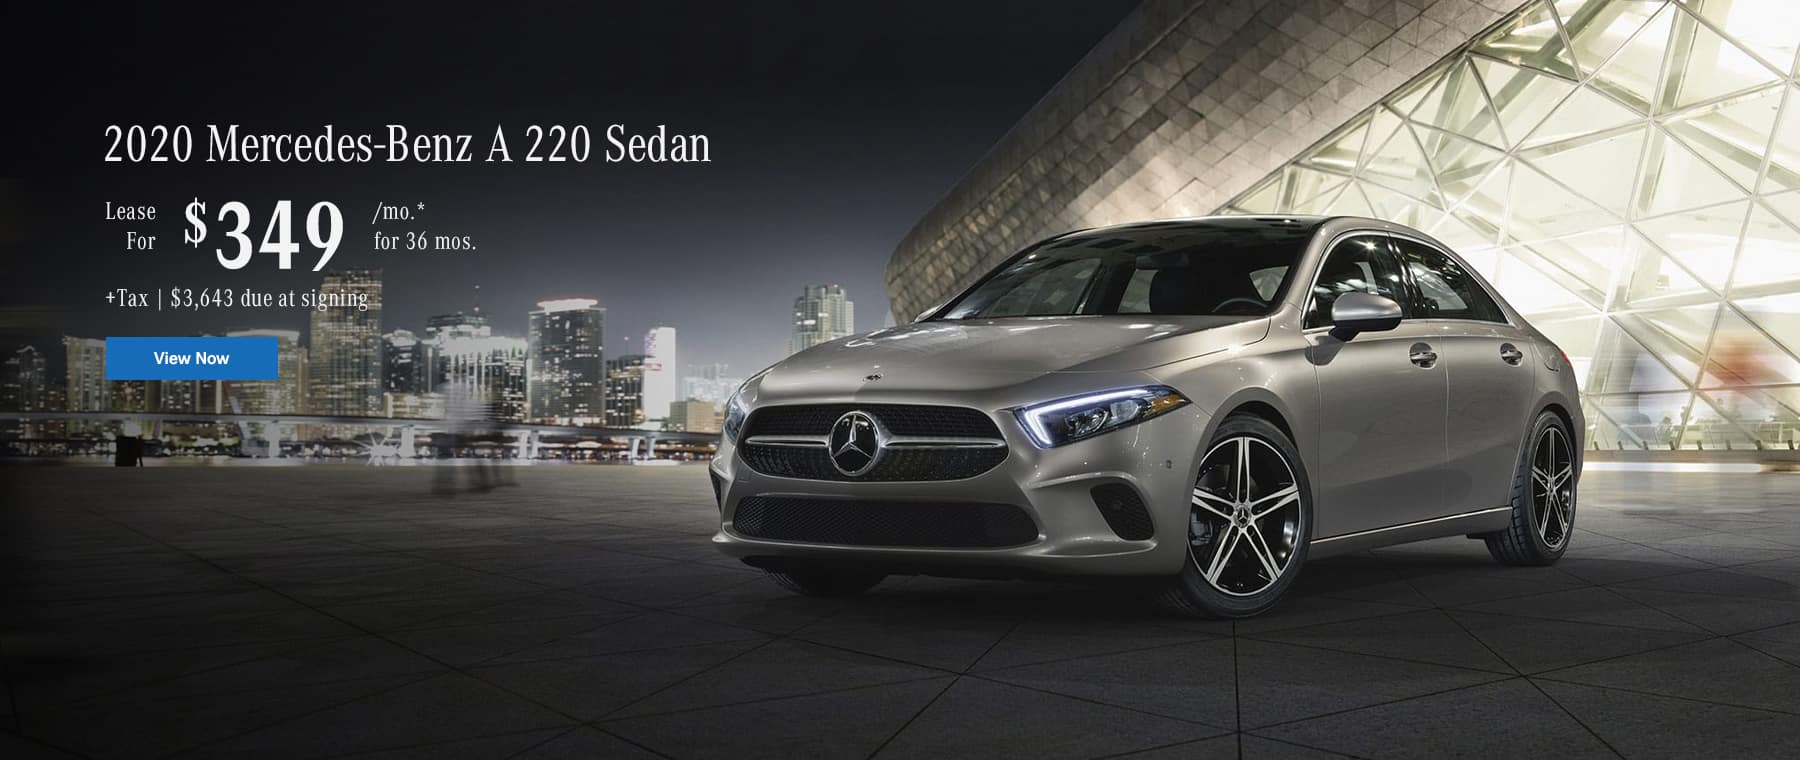 2020 A220 sedan